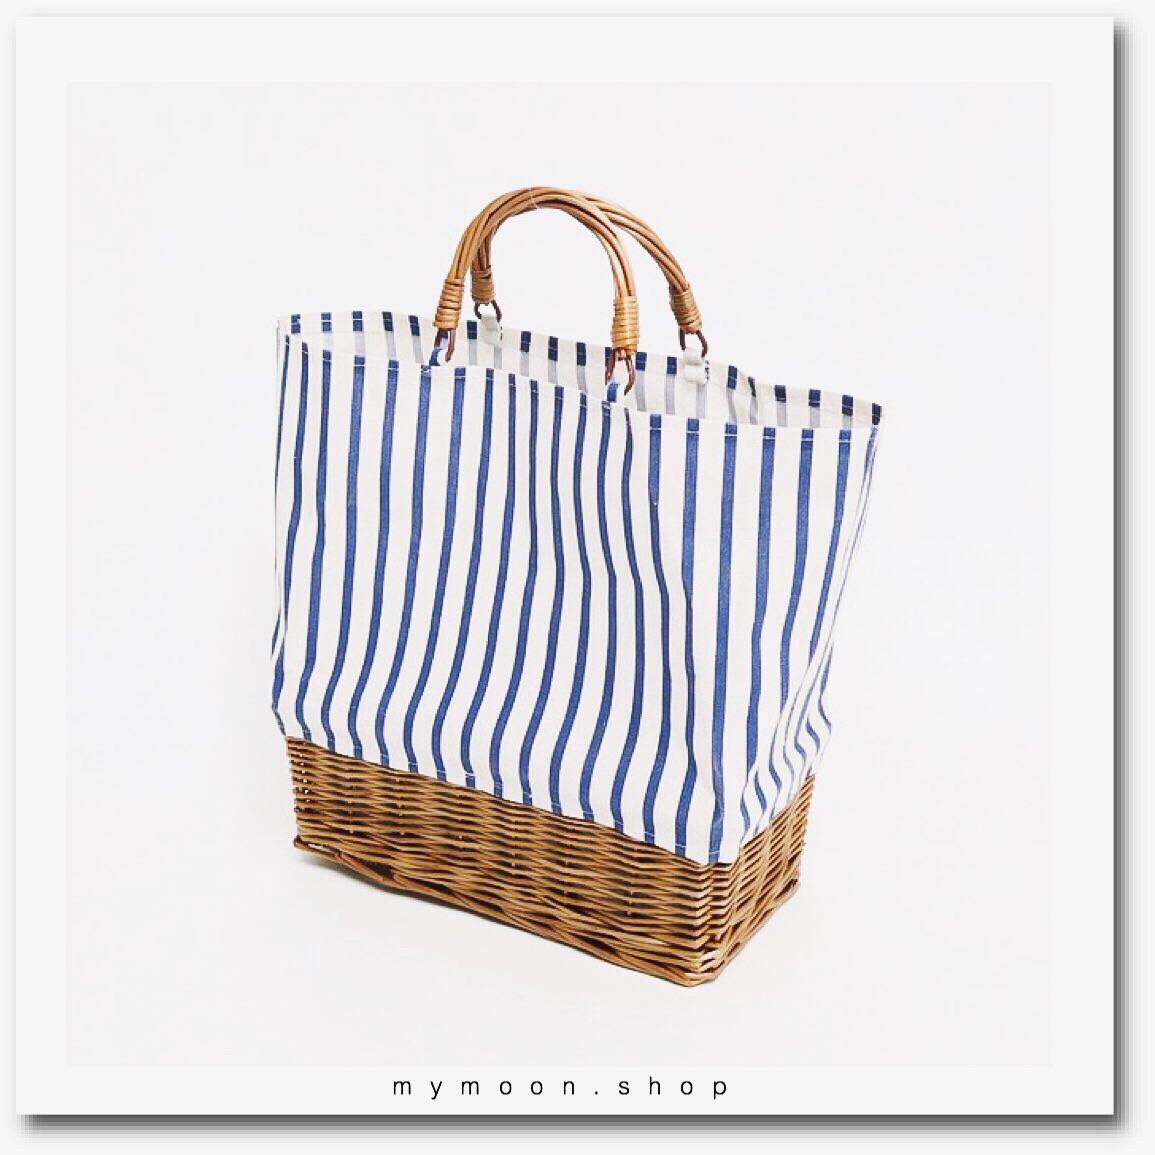 Willow Woven bag combination with fabric stitching ลายริ้วขาวน้ำเงิน